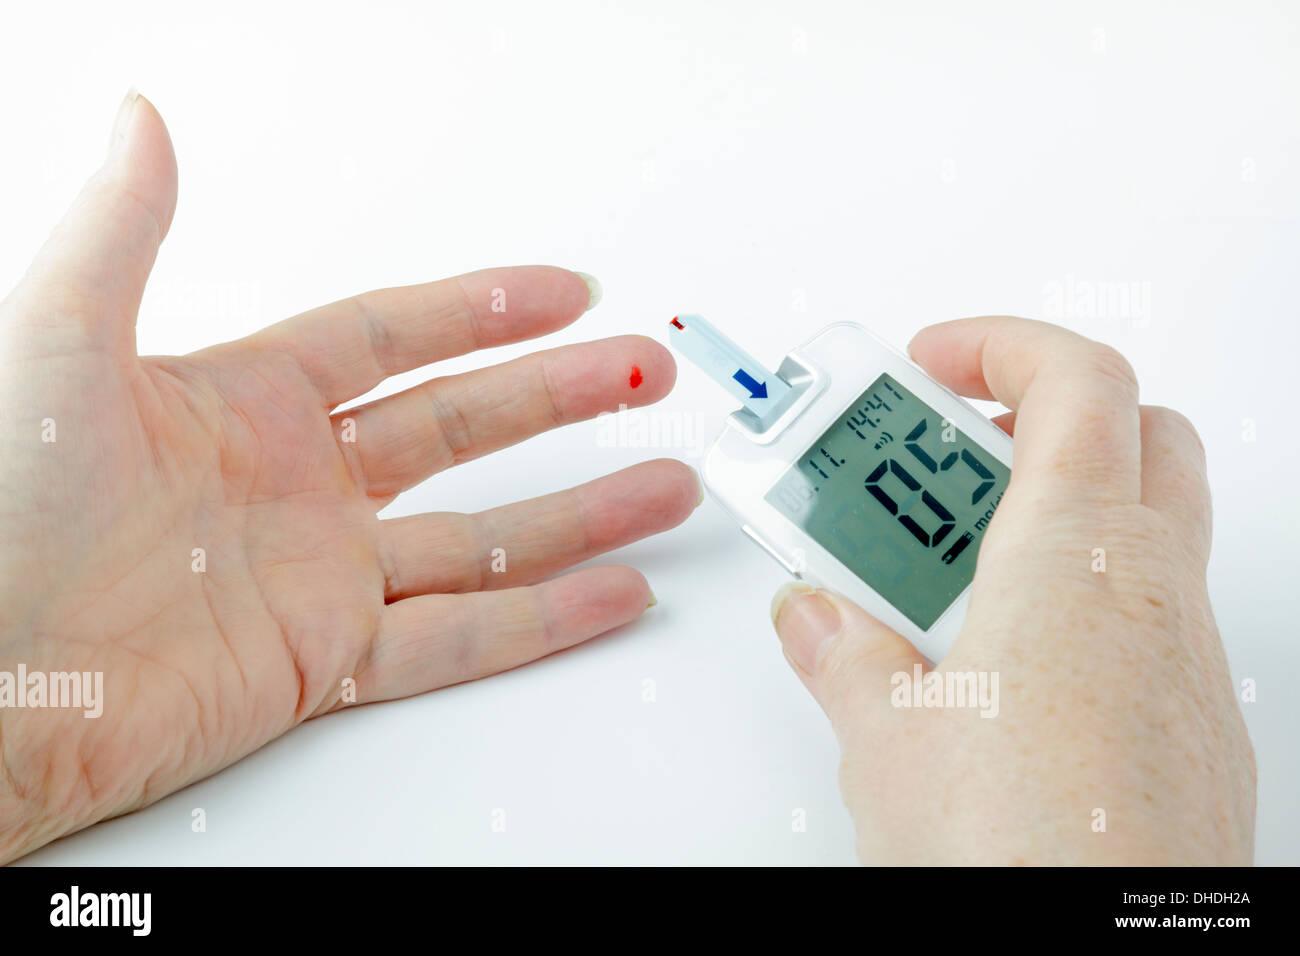 Diabetic blood glucose test - blood on finger tip and meter strip - Stock Image